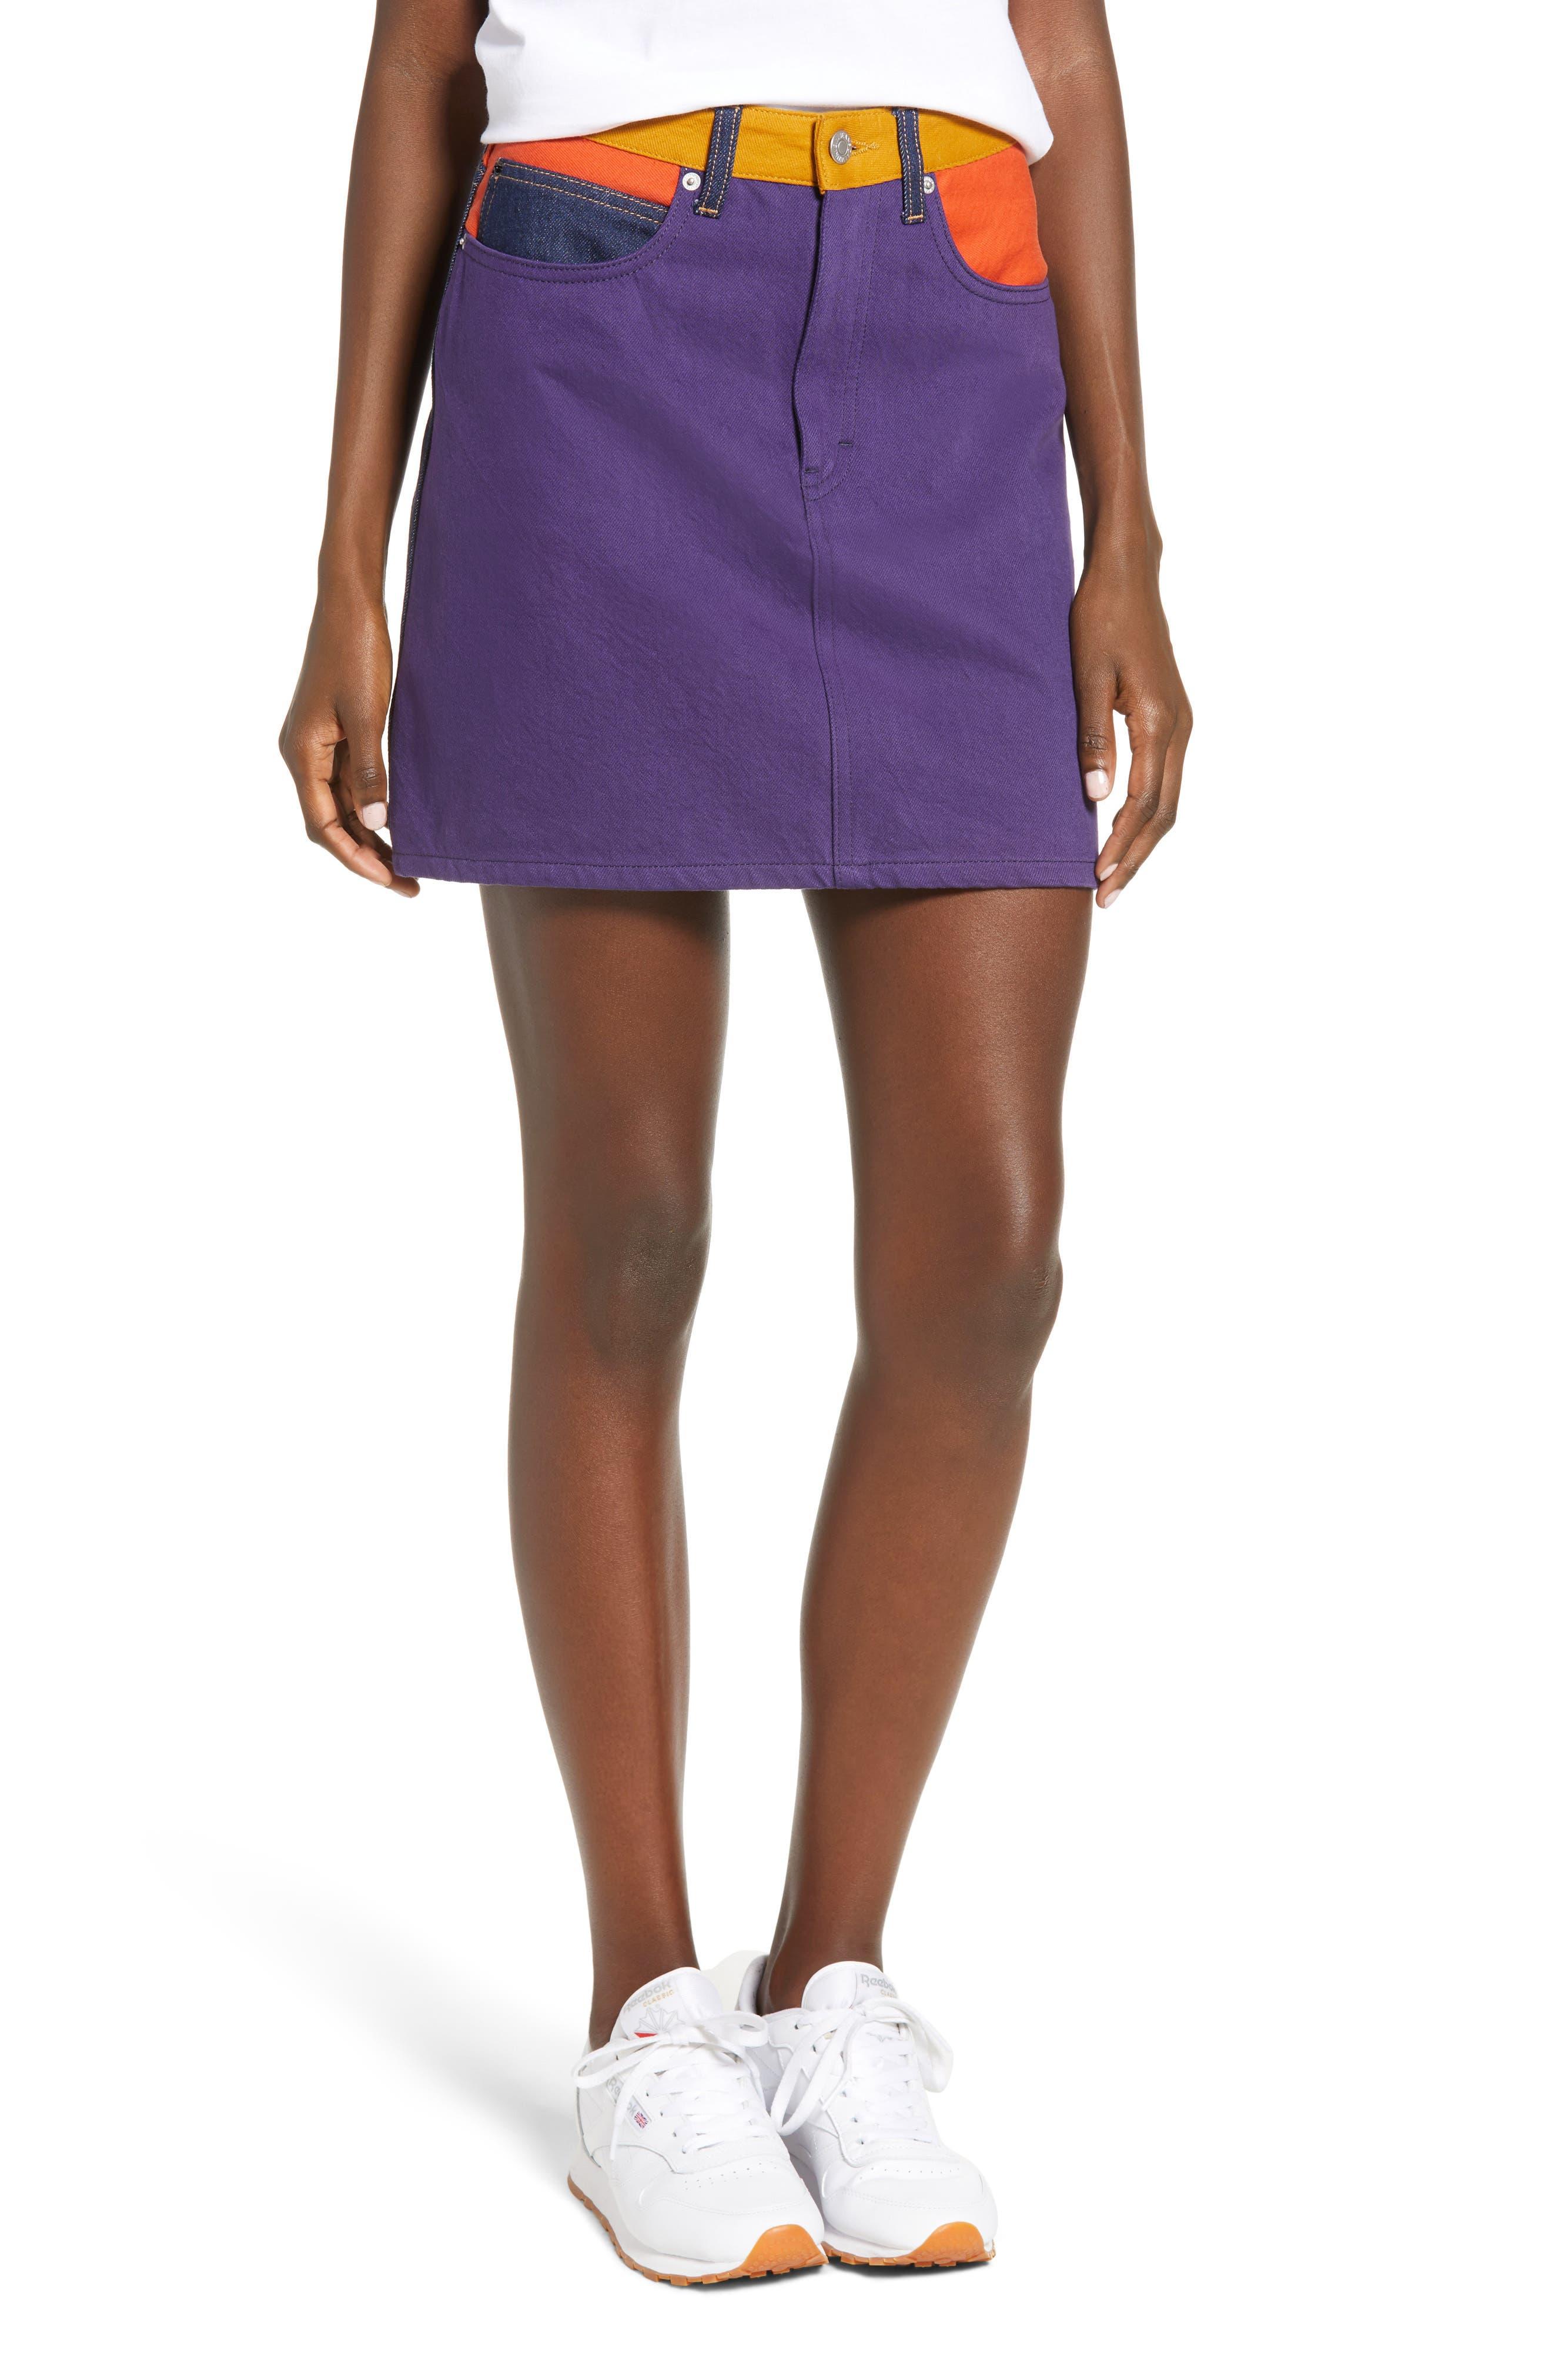 Calvin Klein Jeans Hr Miniskirt, Purple